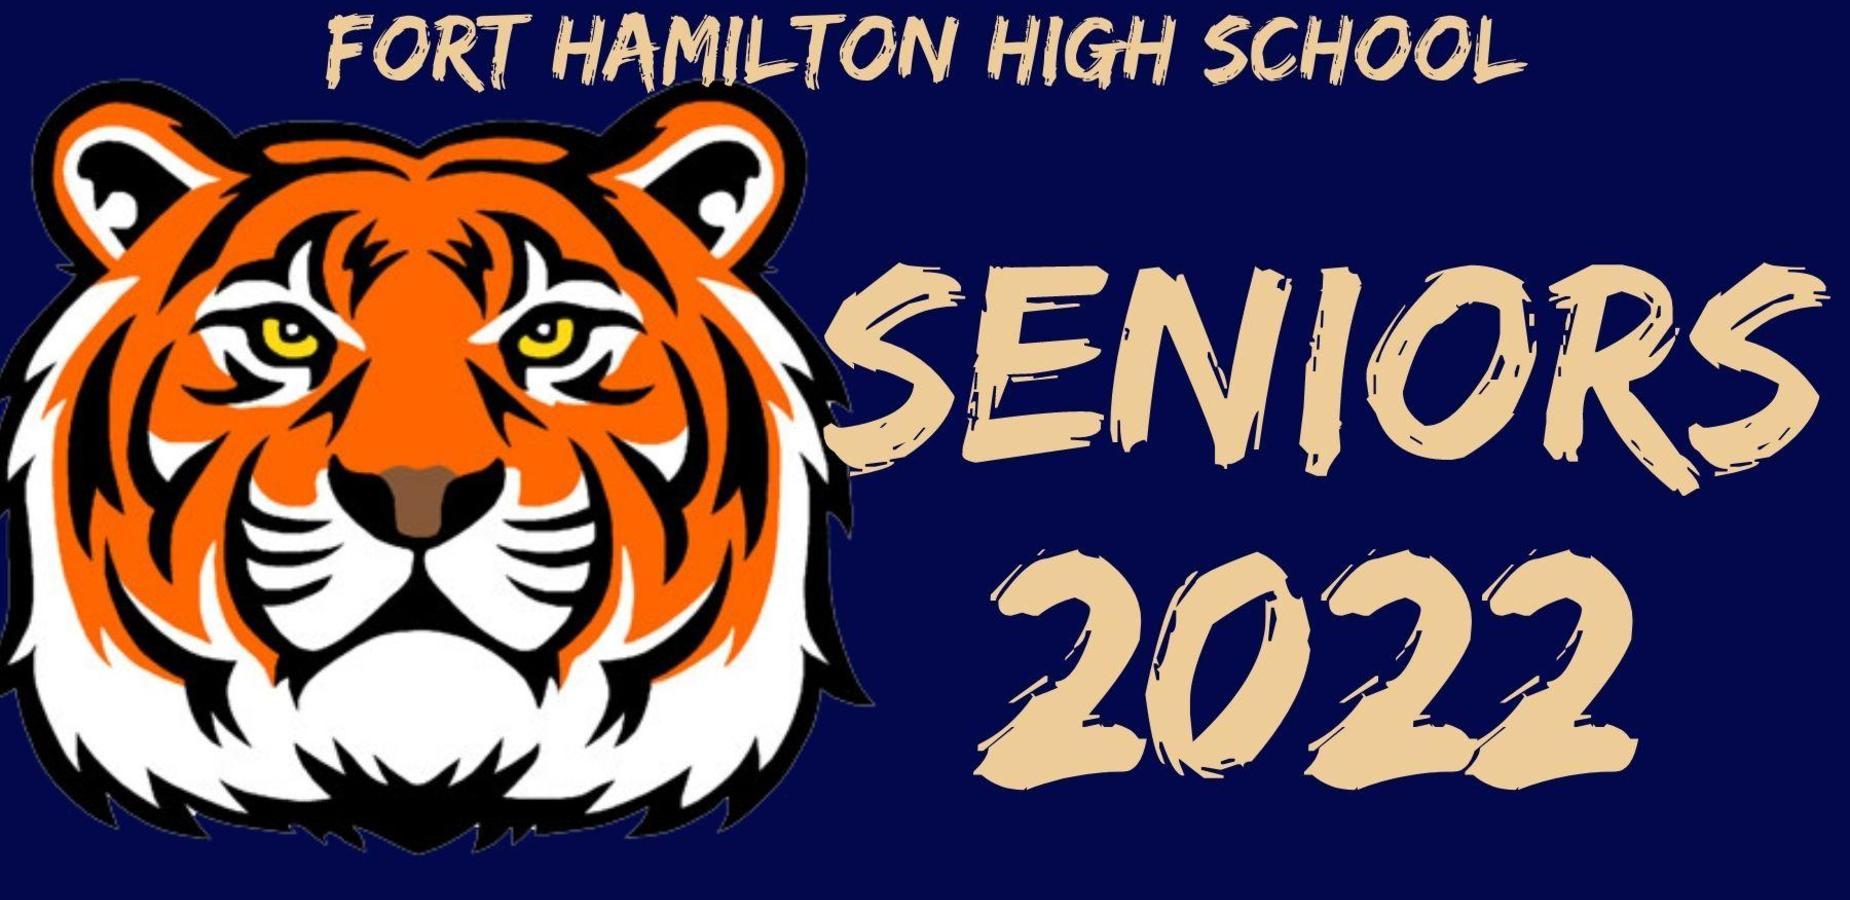 Fort Hamilton High School Seniors 2022. Tiger head on the left